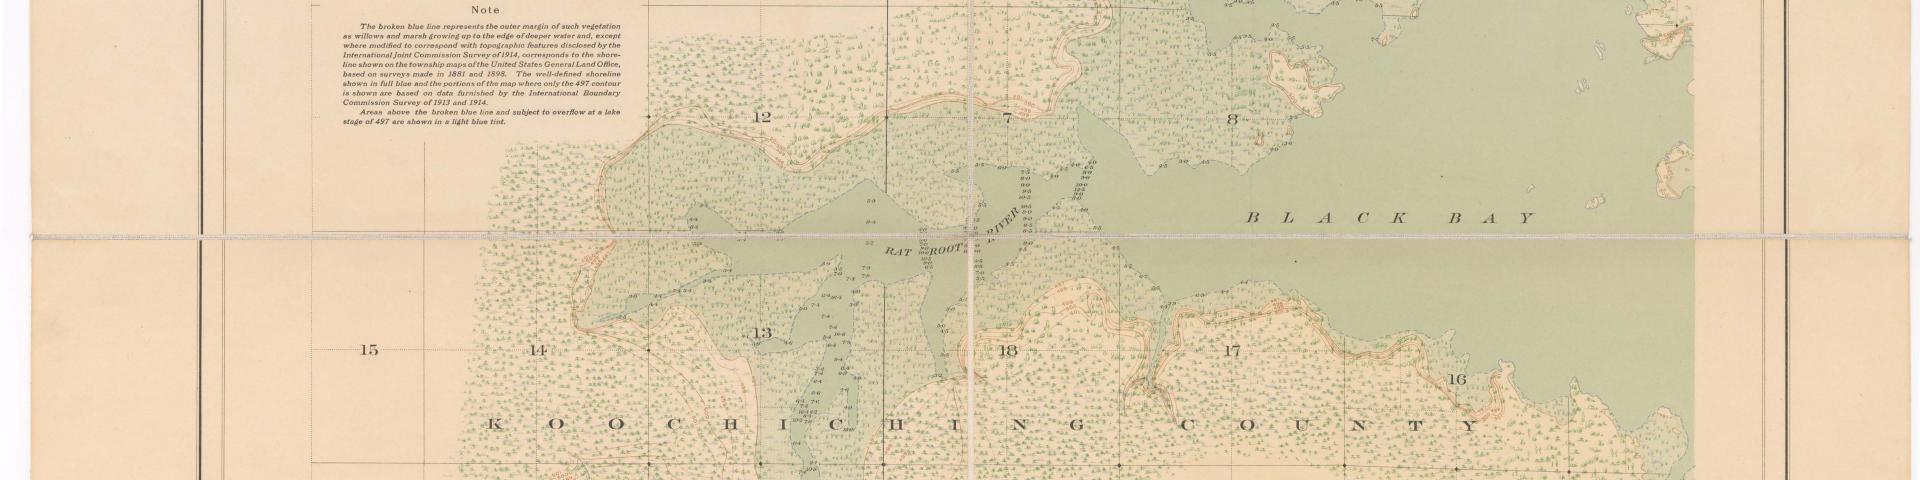 1914 rainy lake map